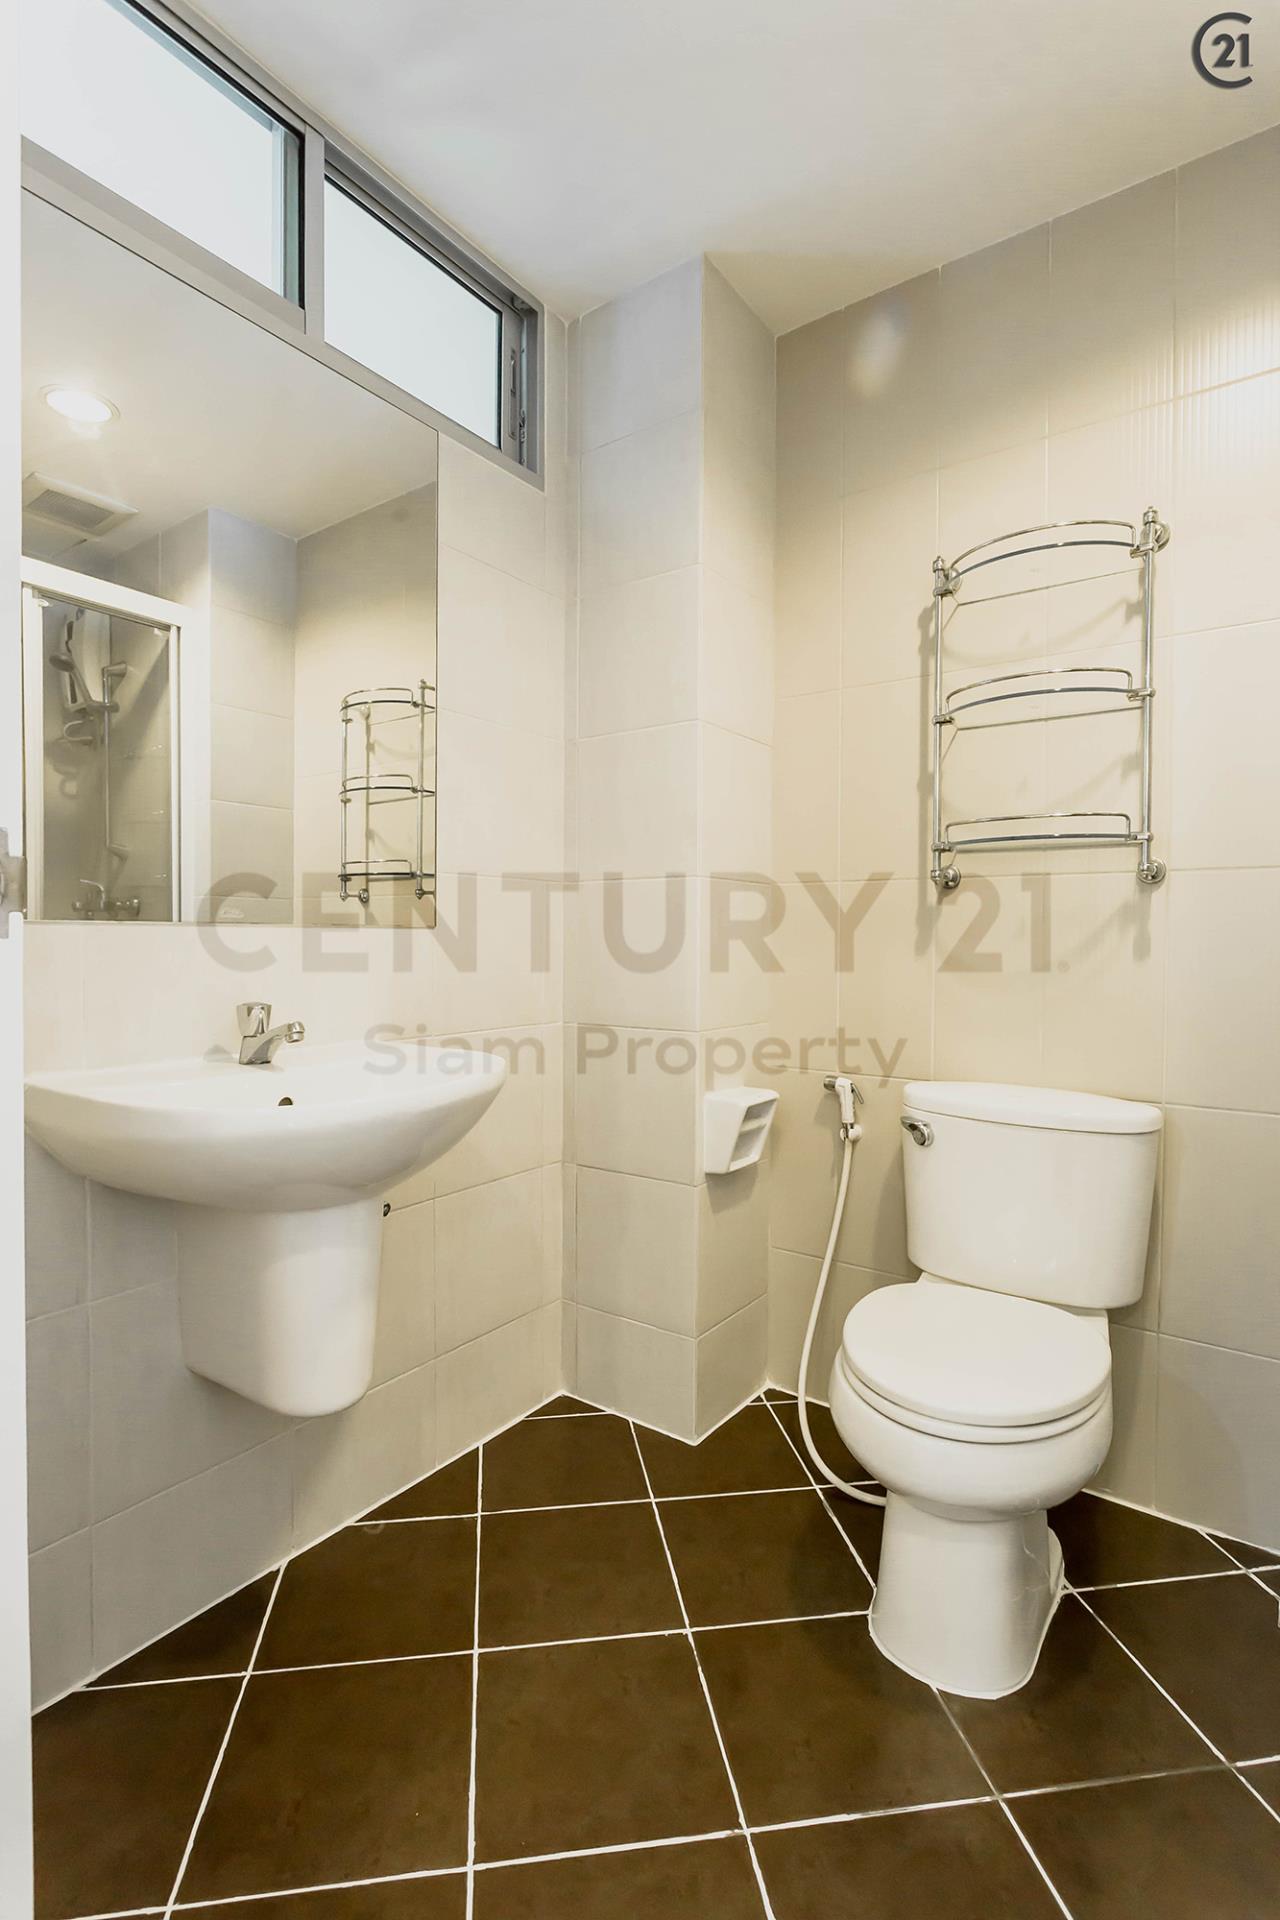 Century21 Siam Property Agency's Condo One X Sukhumvit 26 5